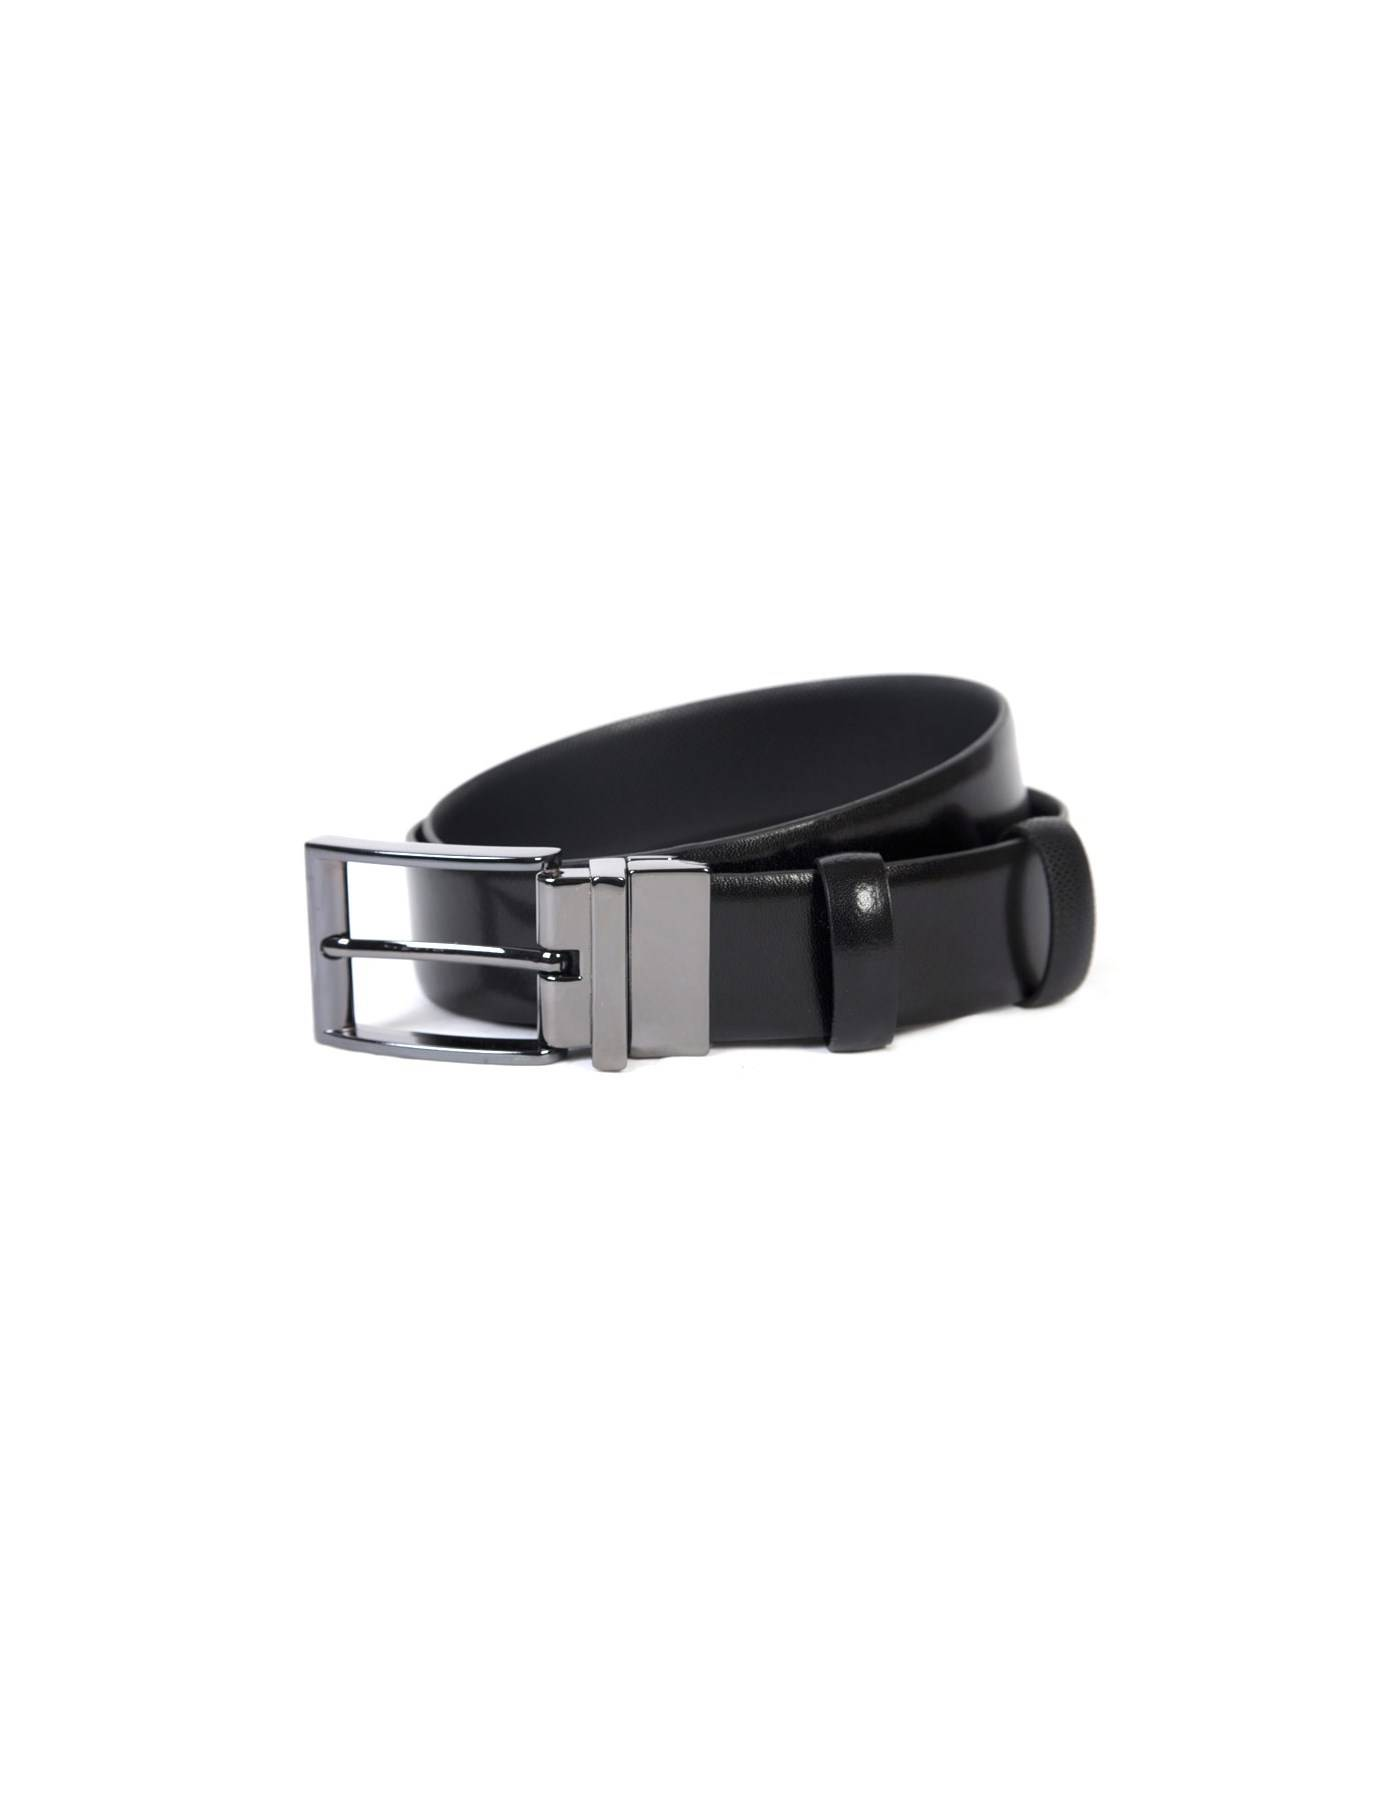 Hawes & Curtis Men's Textured Reversible Leather Belt in Black XL